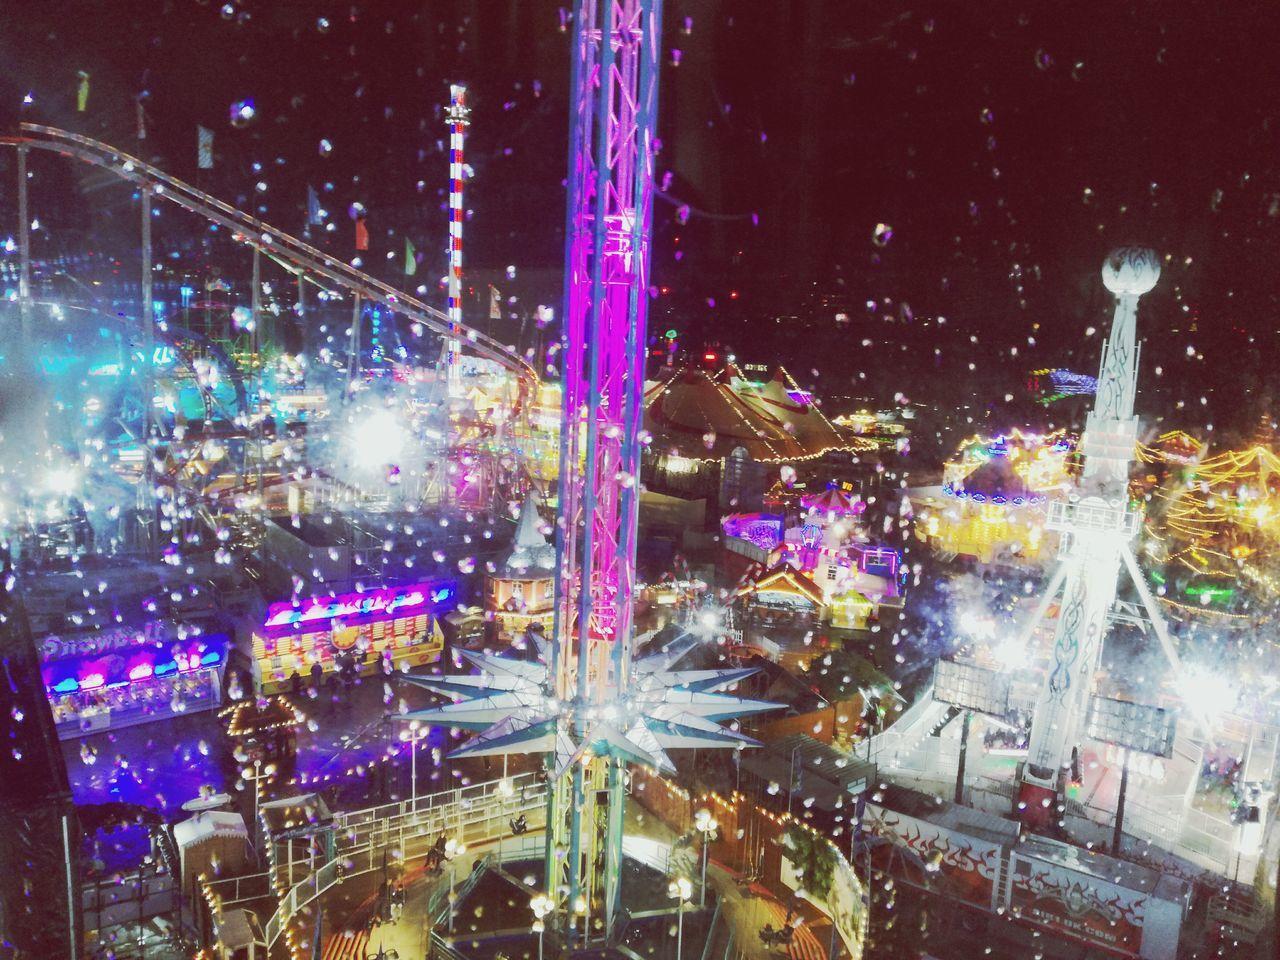 Winter Wonderland ❄ Christmas Lights Outdoors Christmas Market City London